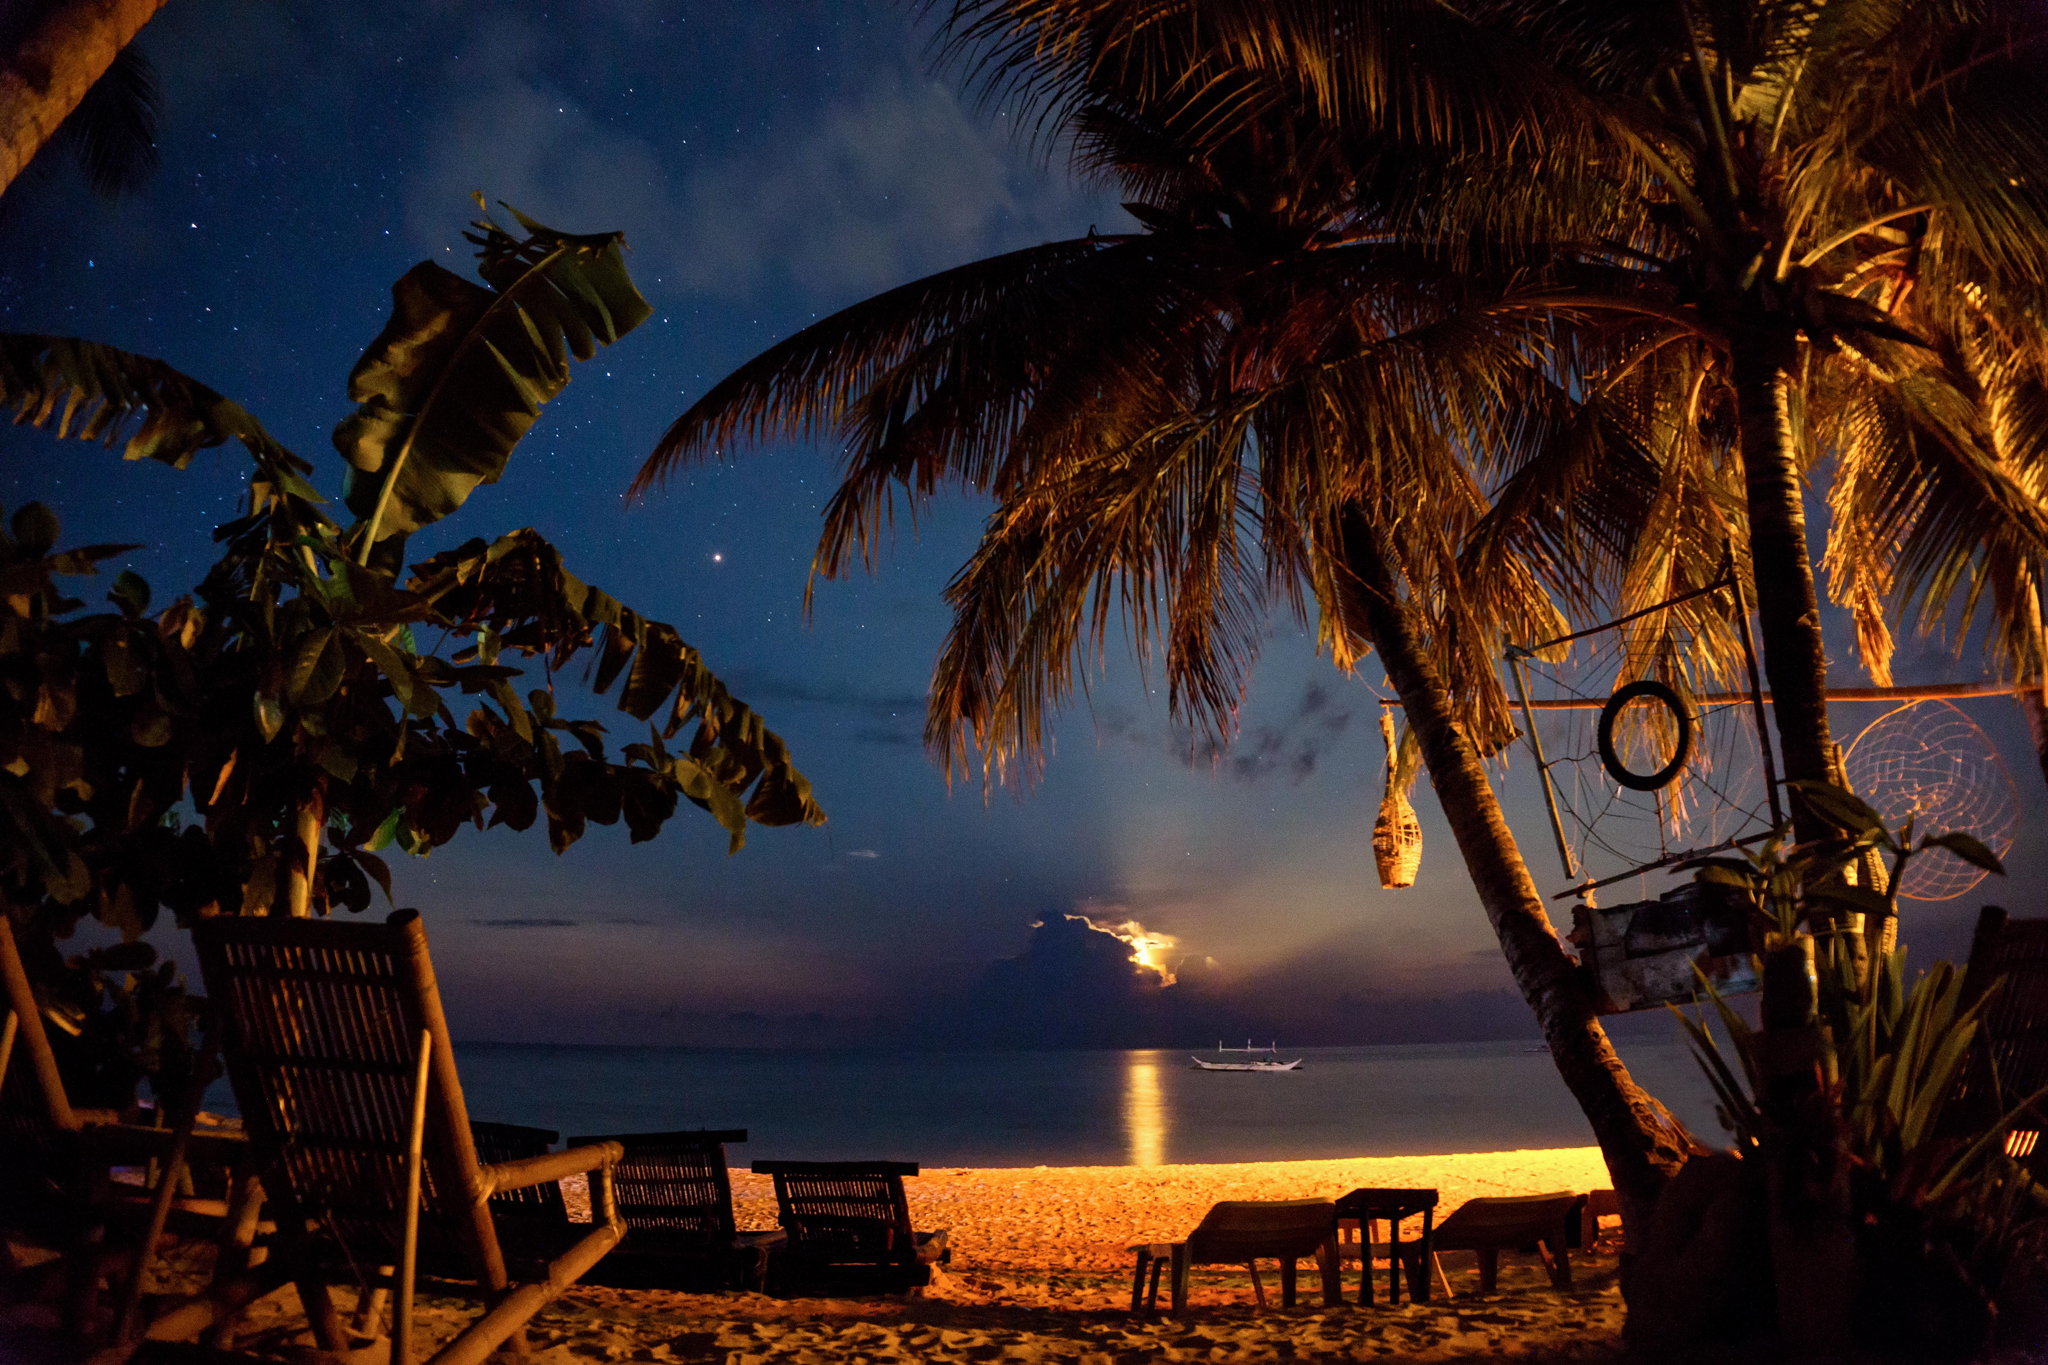 Moonrise in Boracay - Philippines 2016